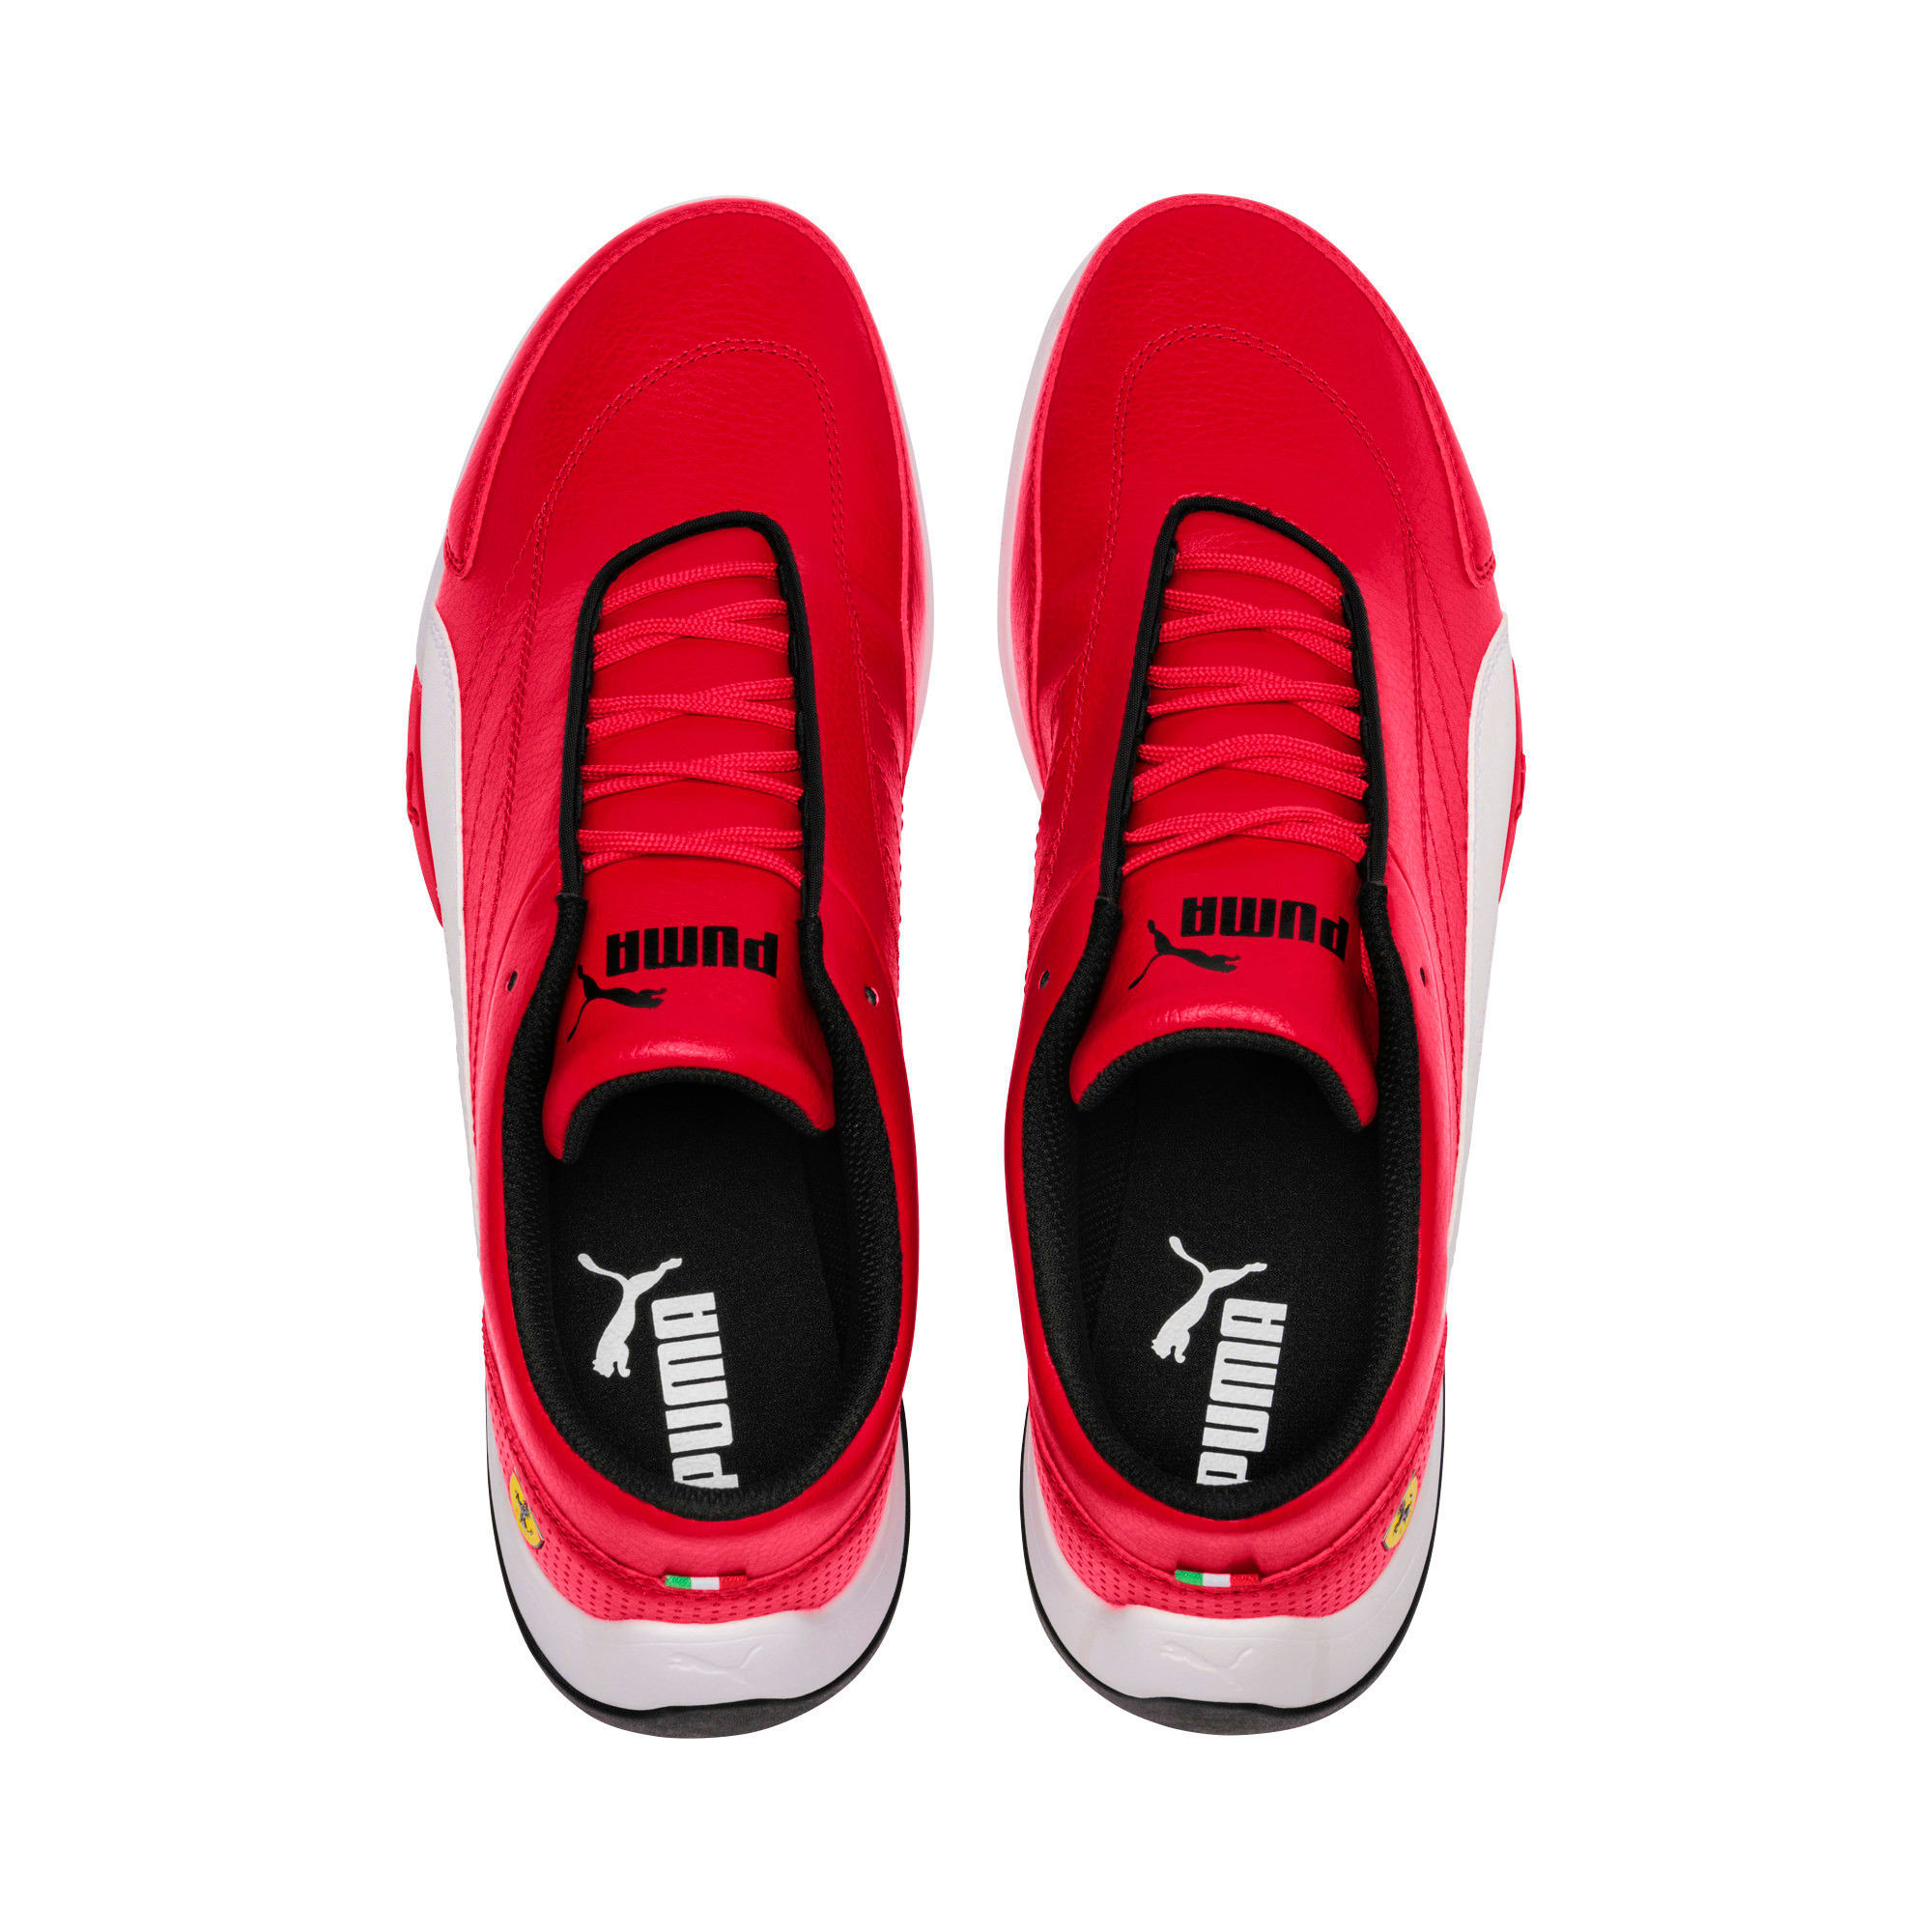 Thumbnail 6 of Scuderia Ferrari Kart Cat III Shoes, Rosso Corsa-Puma White, medium